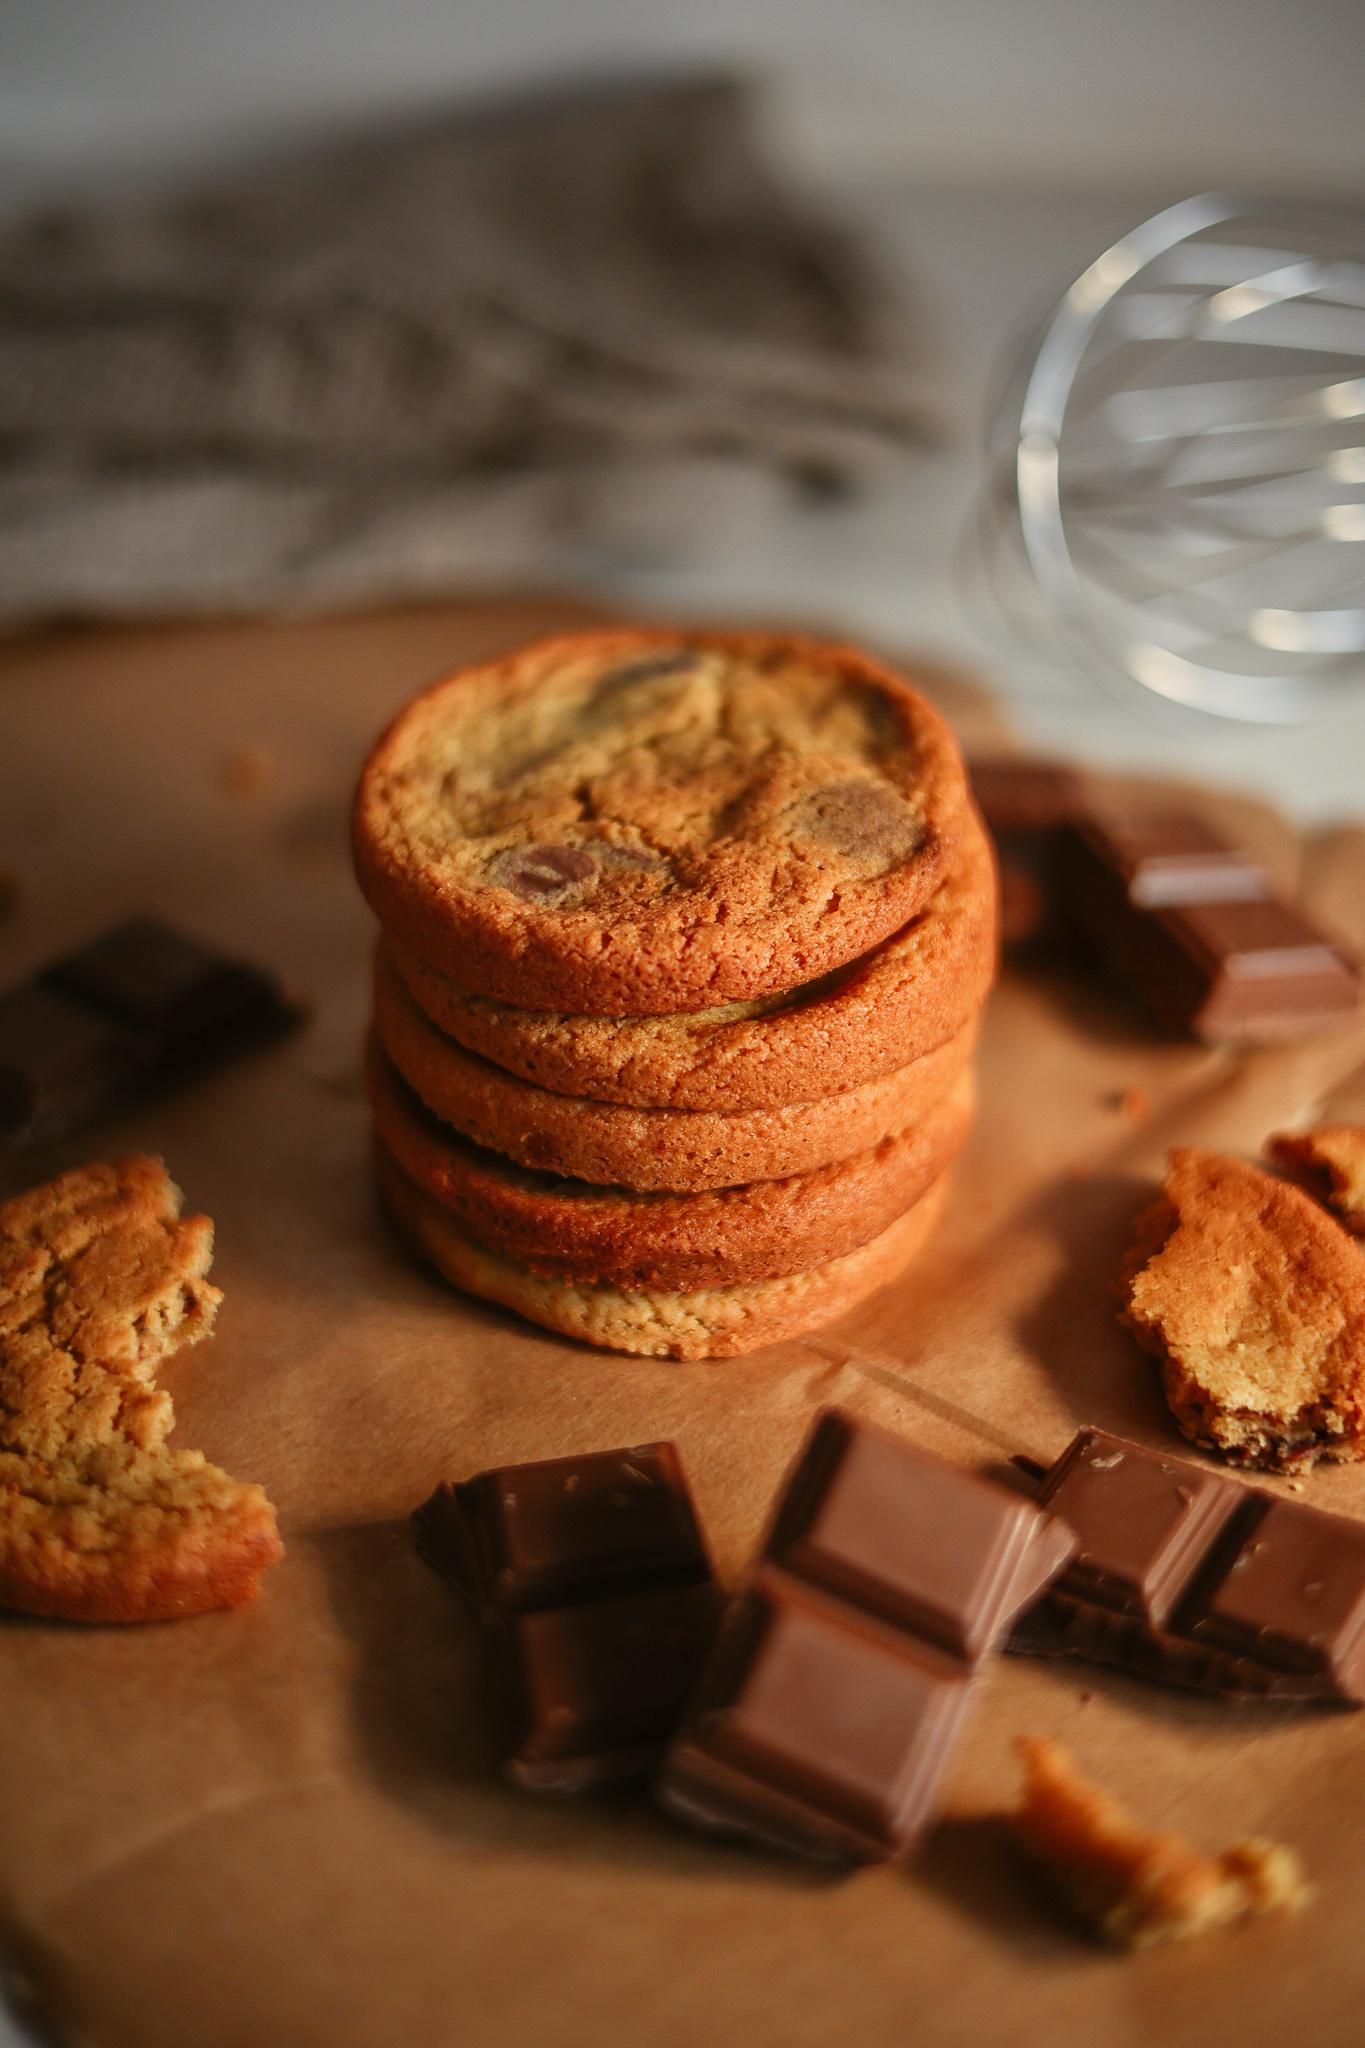 Stack of milk chocolate cookies